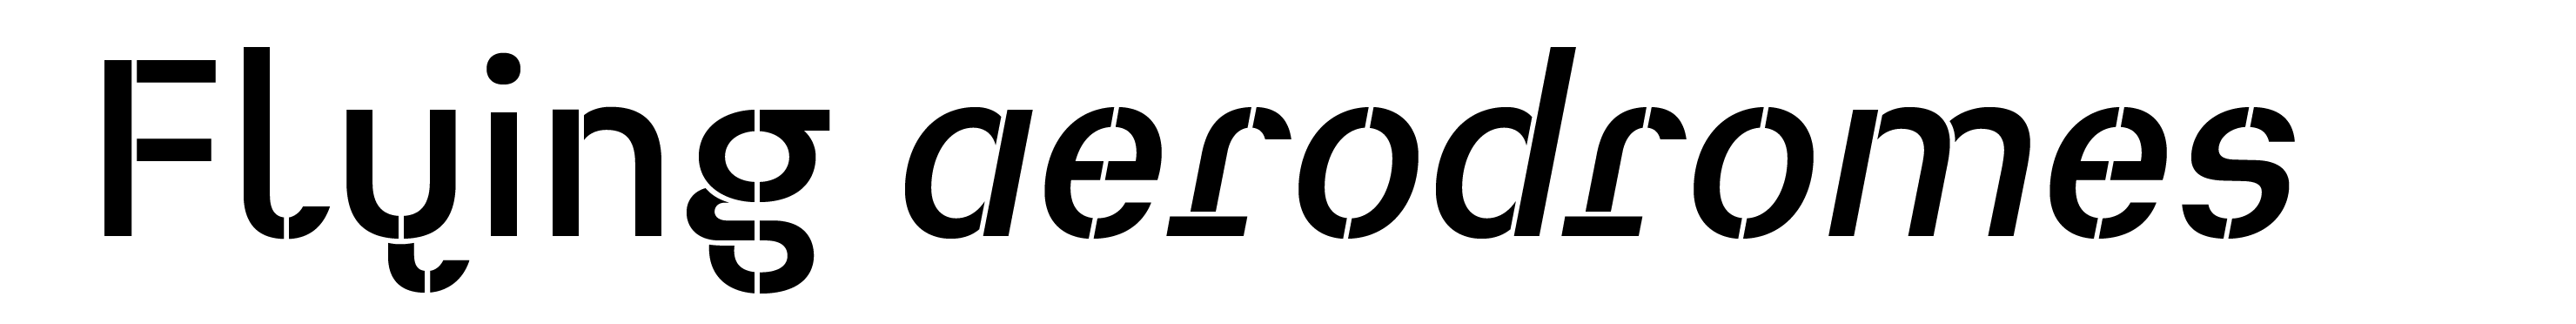 Typeface Heimat Stencil D04 Atlas Font Foundry